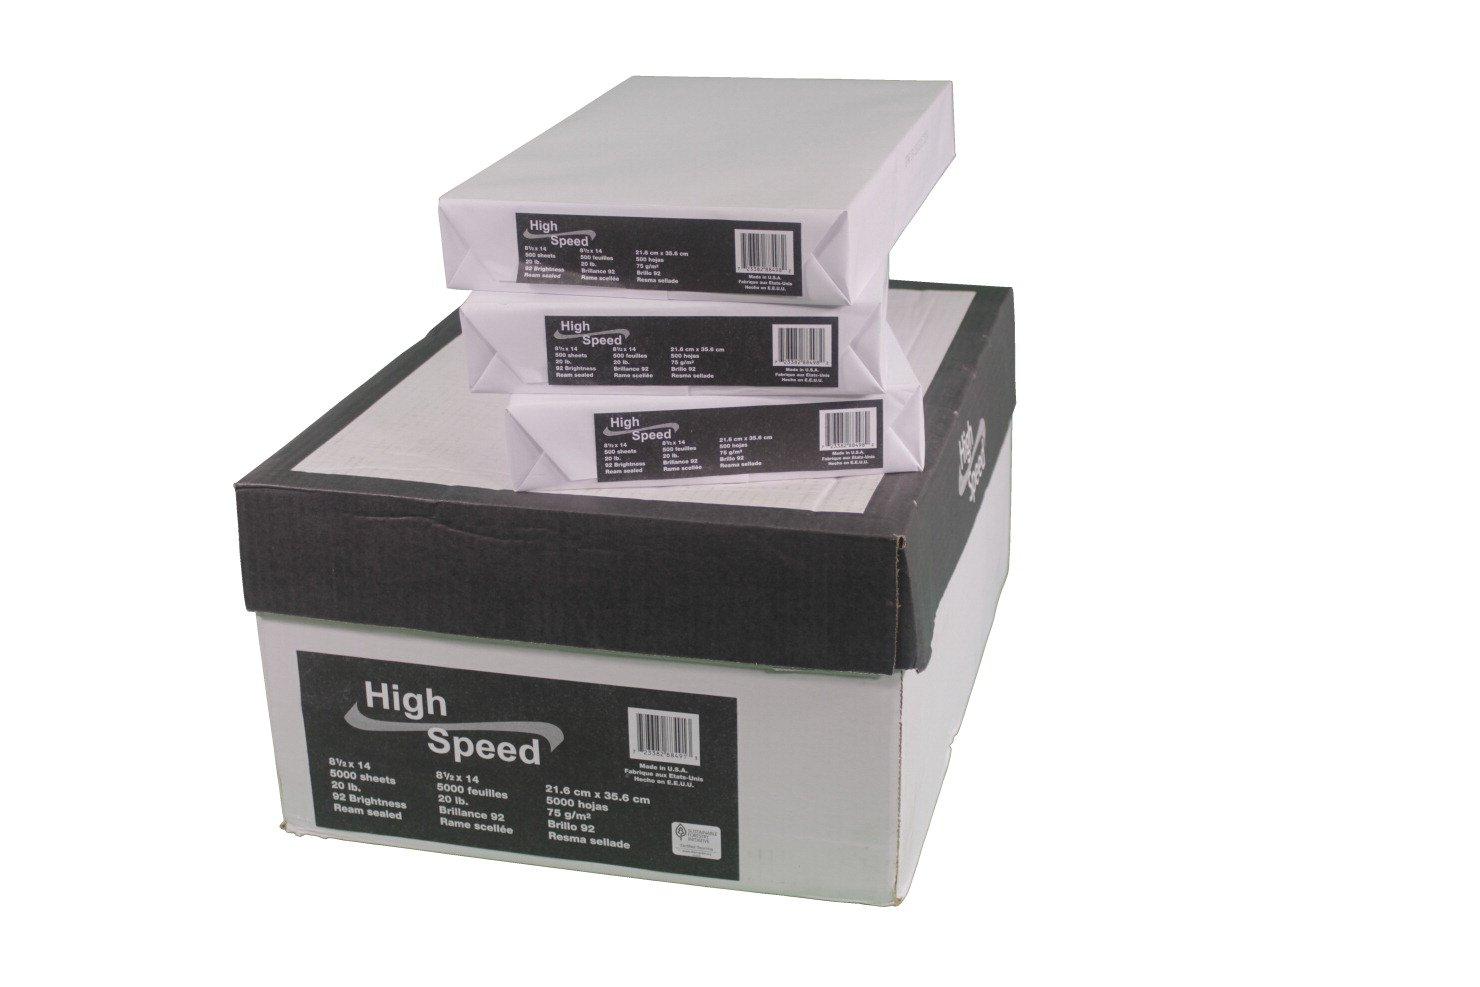 Willcopy 854001 HS Multi-Purpose Copy Paper, Legal Size, 8-1/2'' x 14'' Size, Bright White